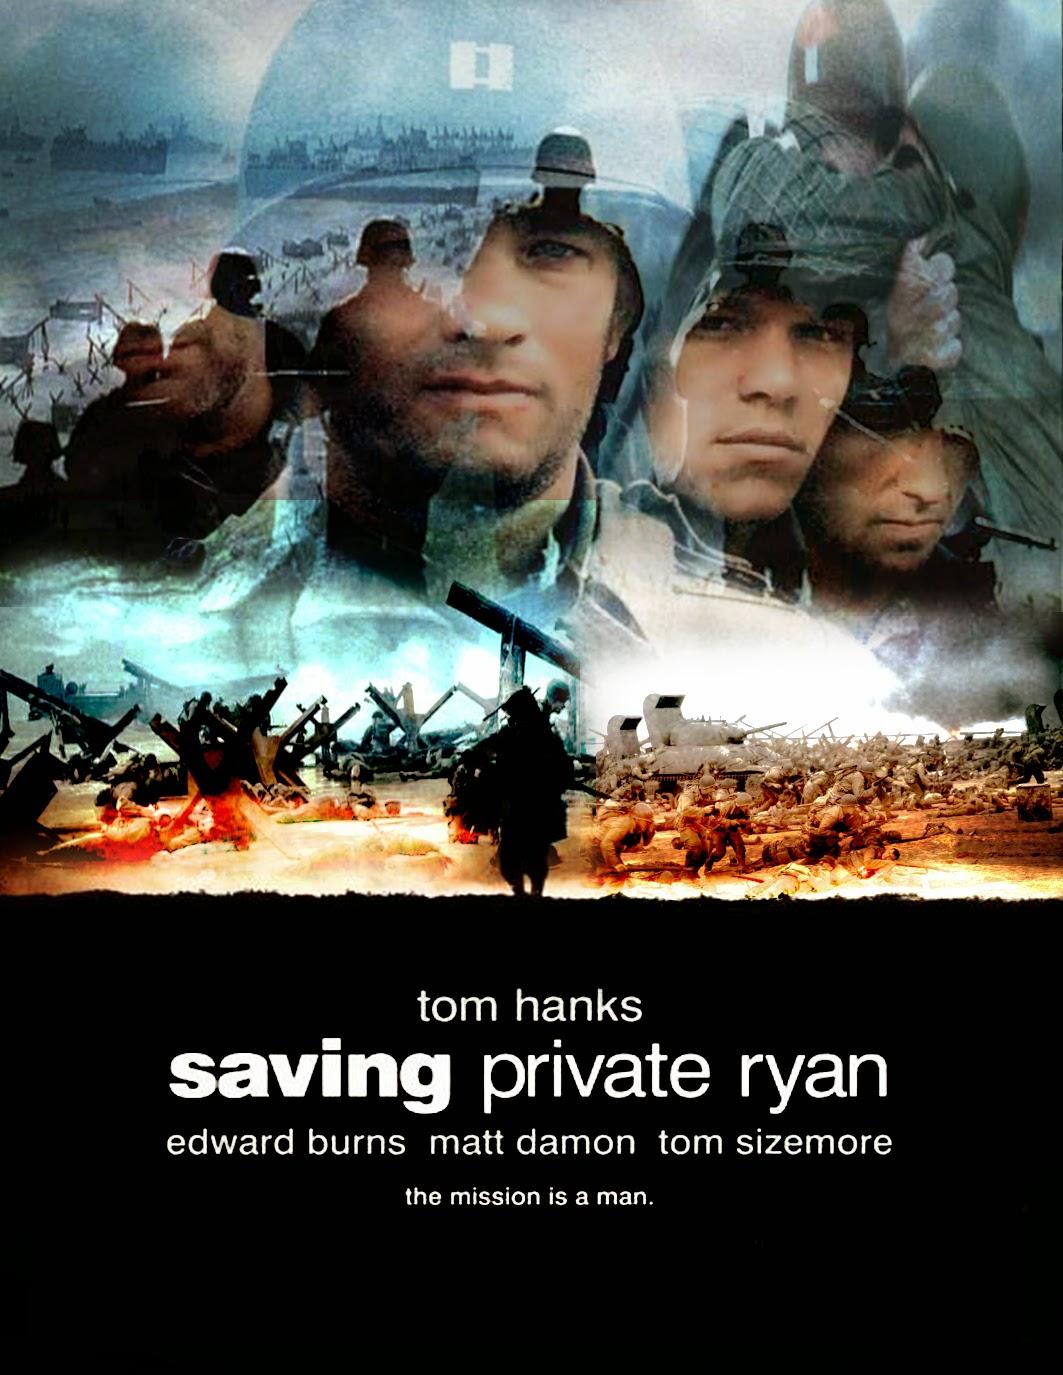 essay on saving private ryan template essay on saving private ryan